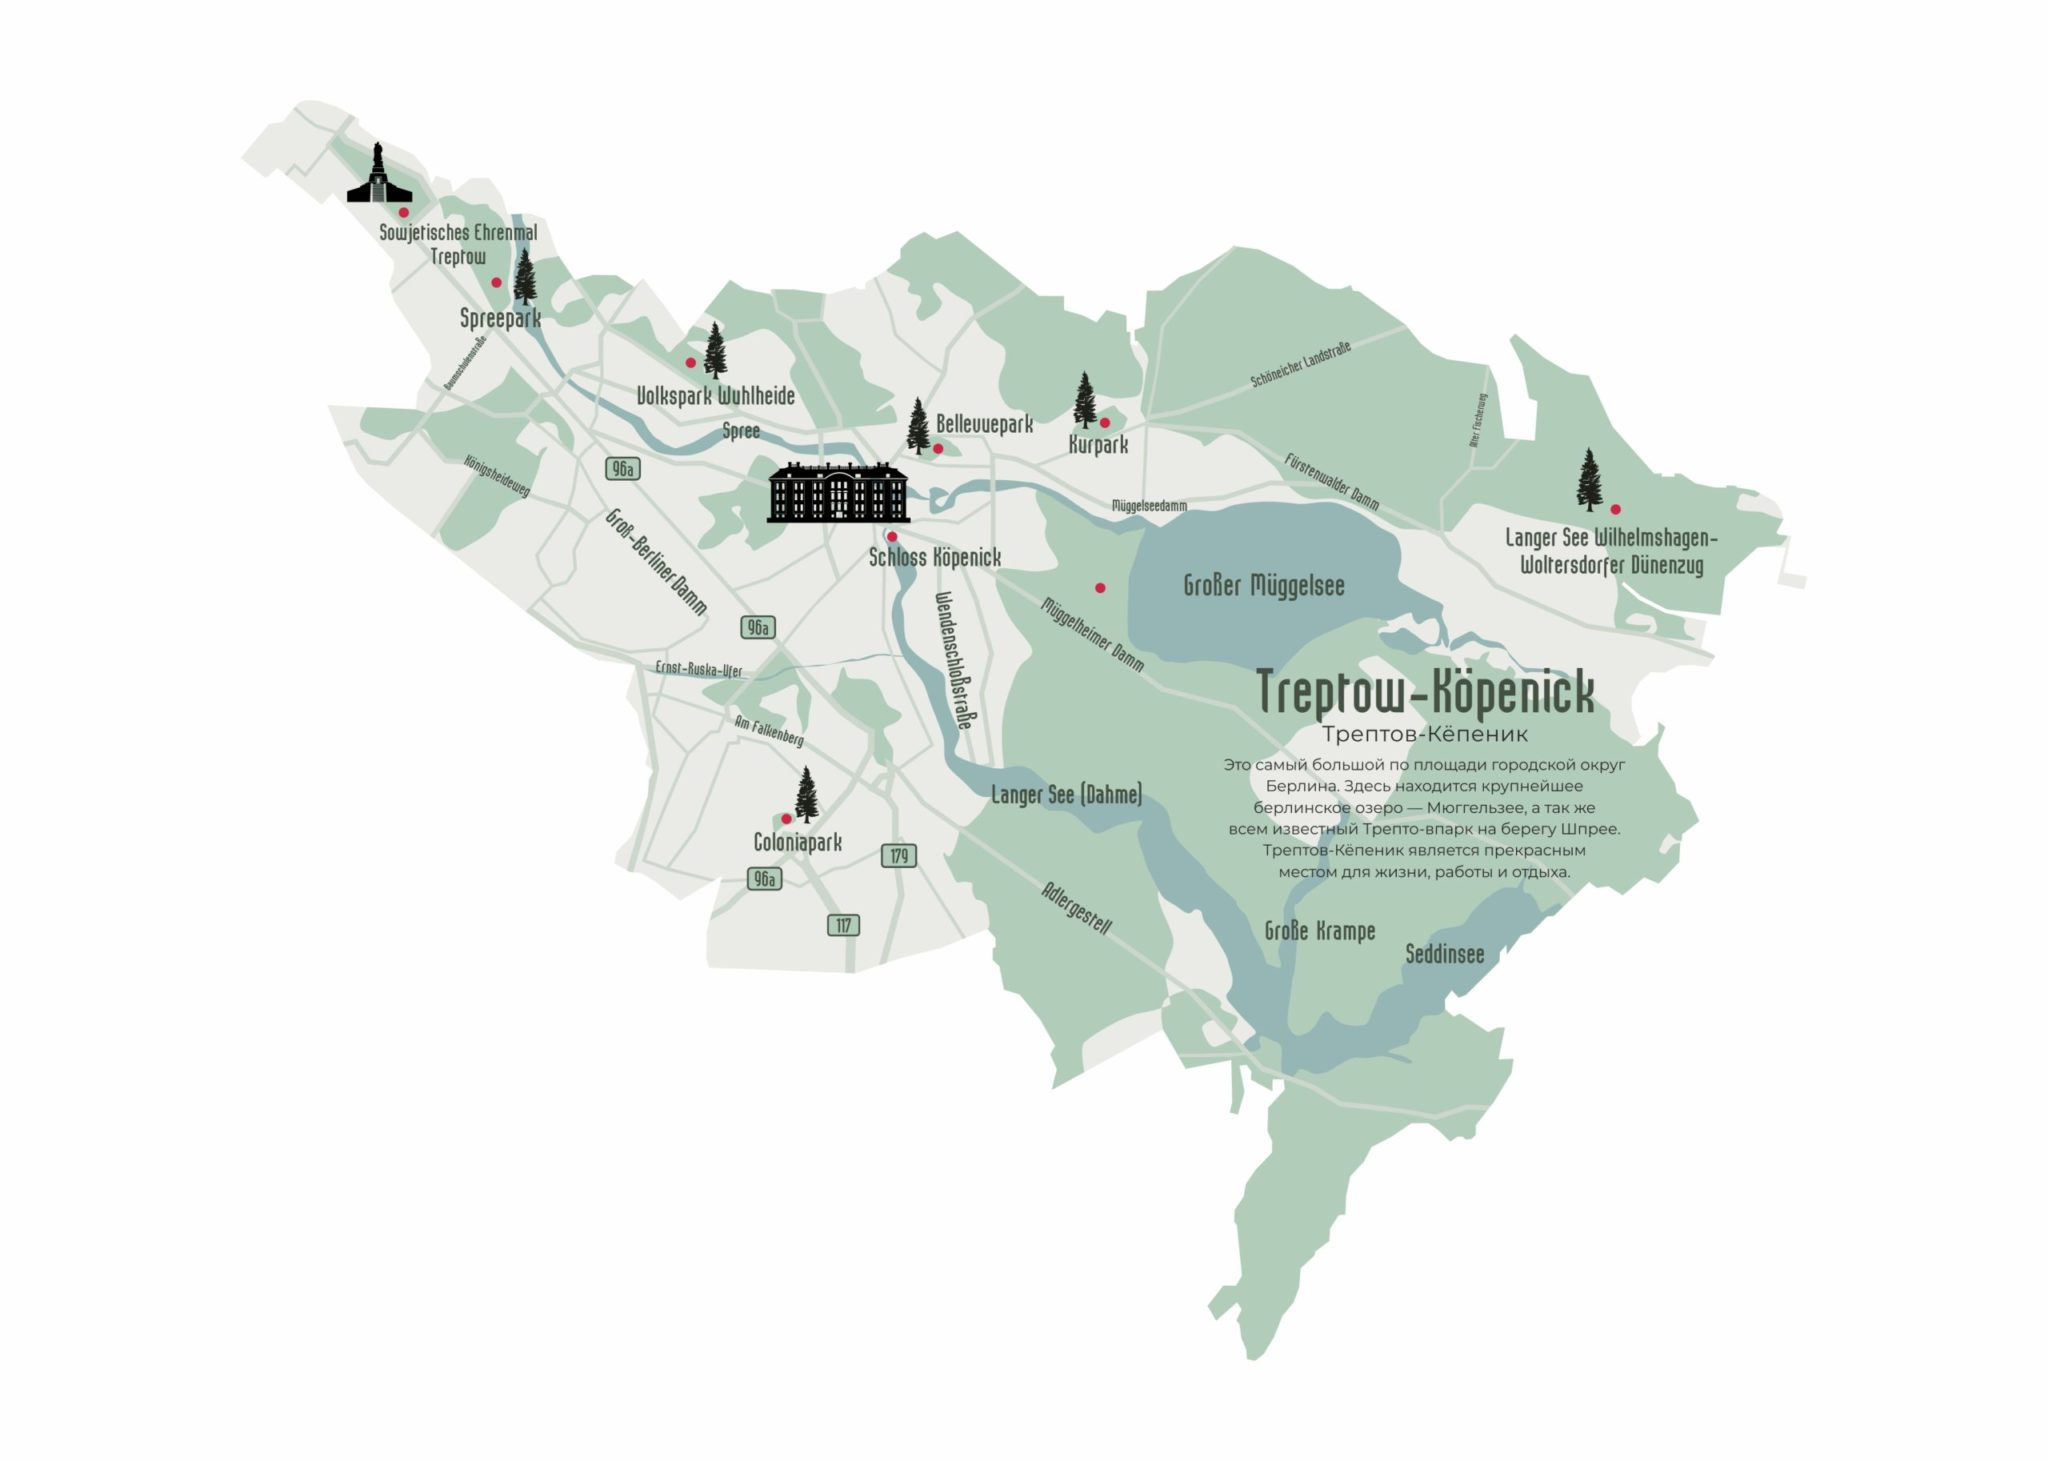 Treptow-Köpenick_1